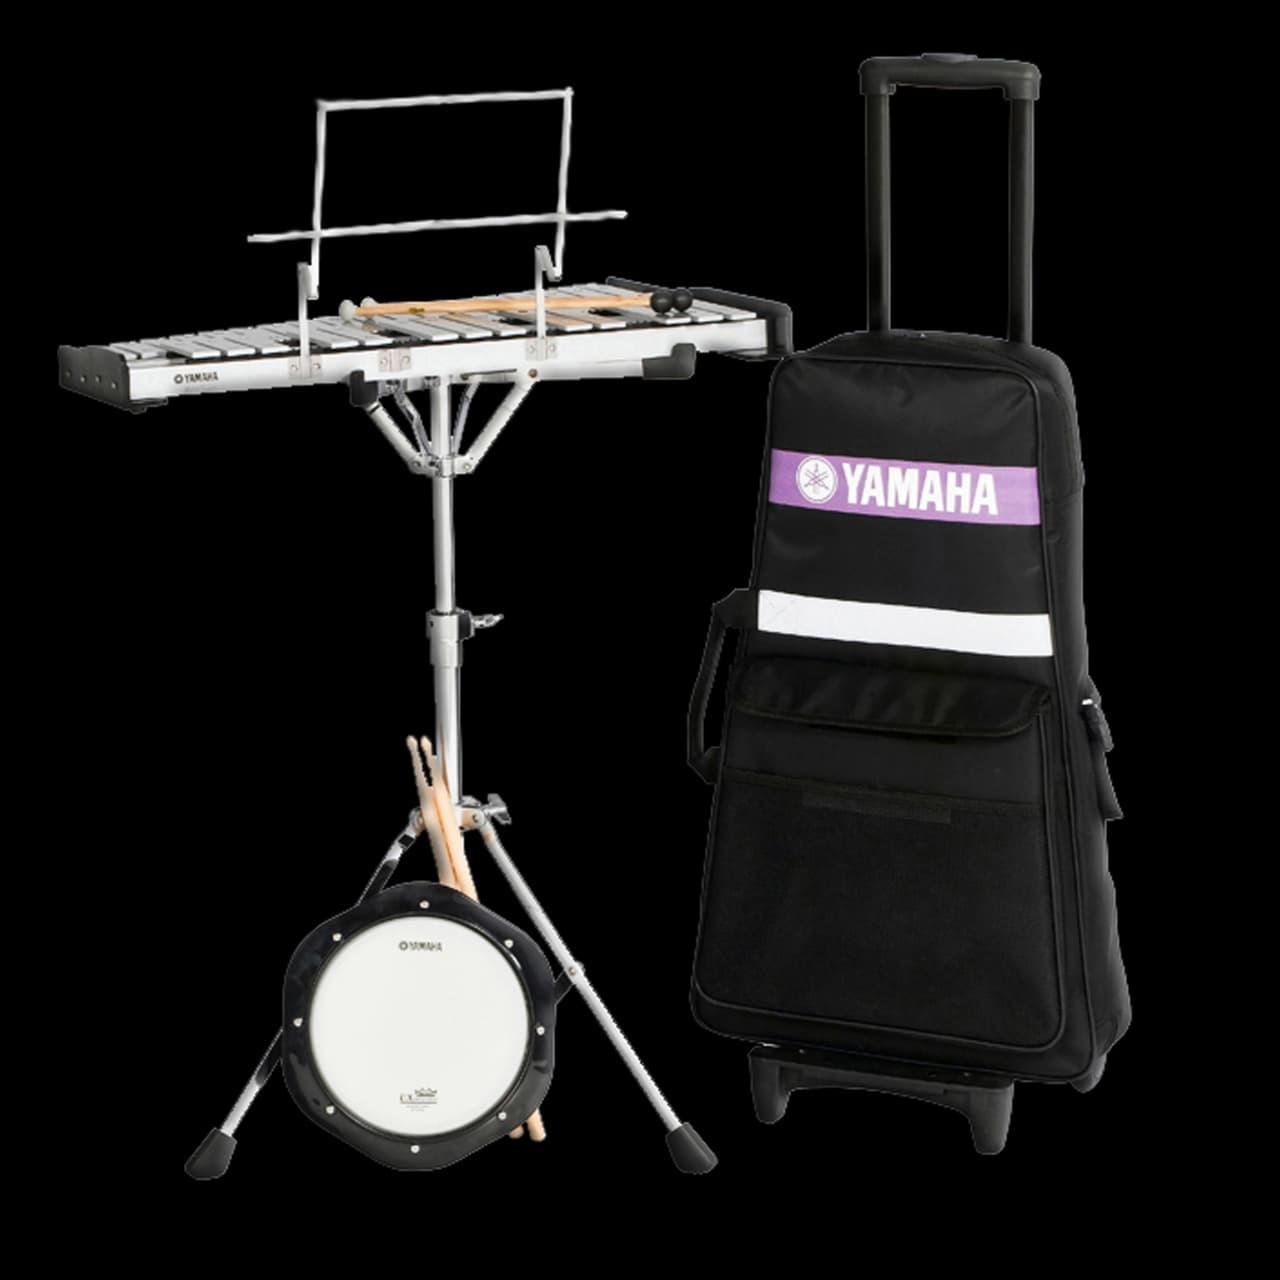 yamaha spk 275r student bell kit with rolling cart reverb. Black Bedroom Furniture Sets. Home Design Ideas